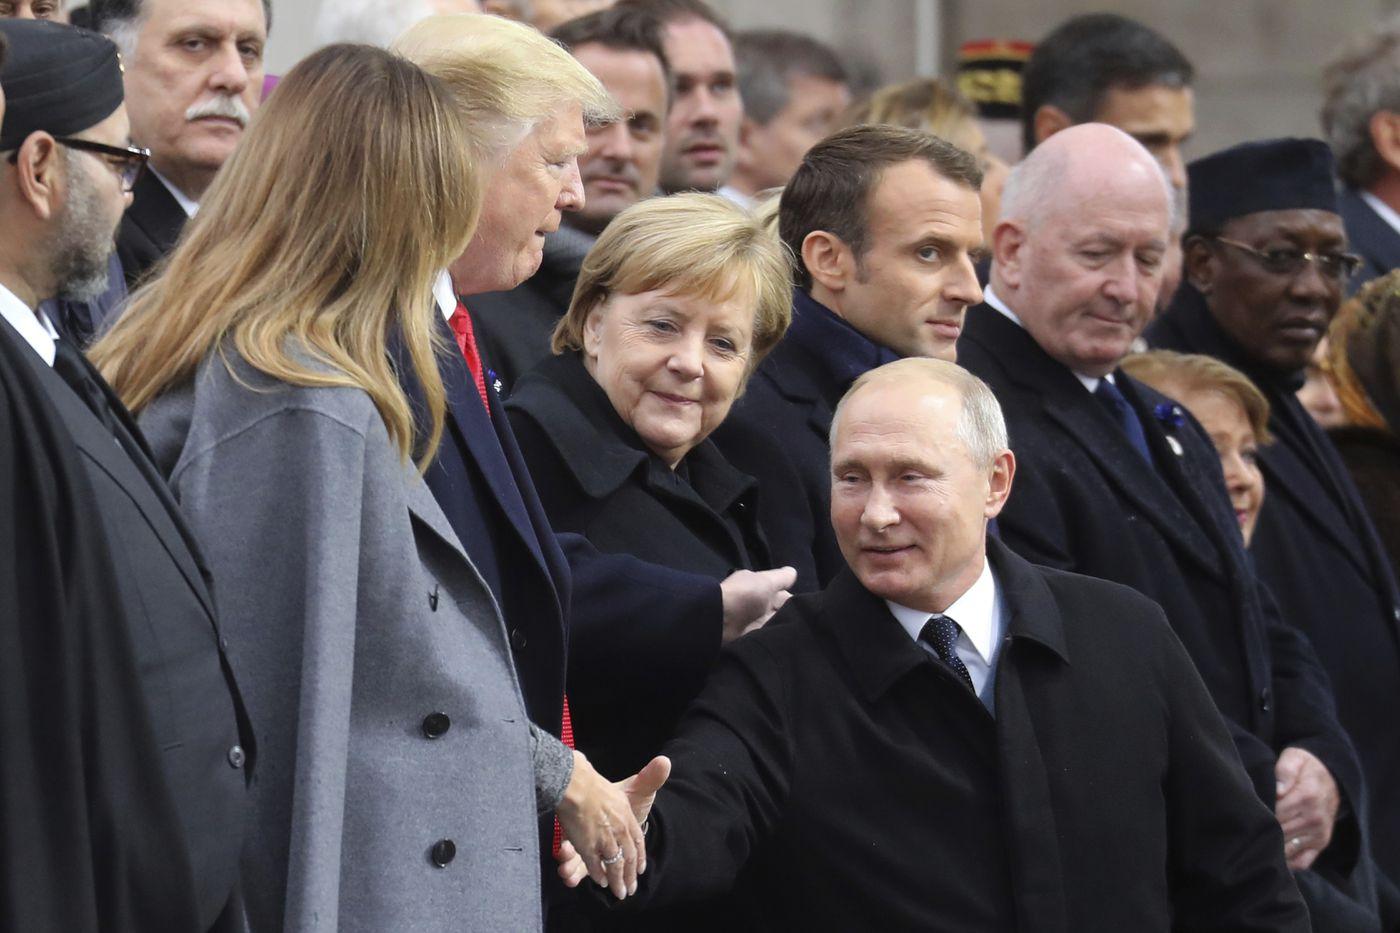 Angela Merkel Topless the latest: leaders discuss ukraine elections at paris meet